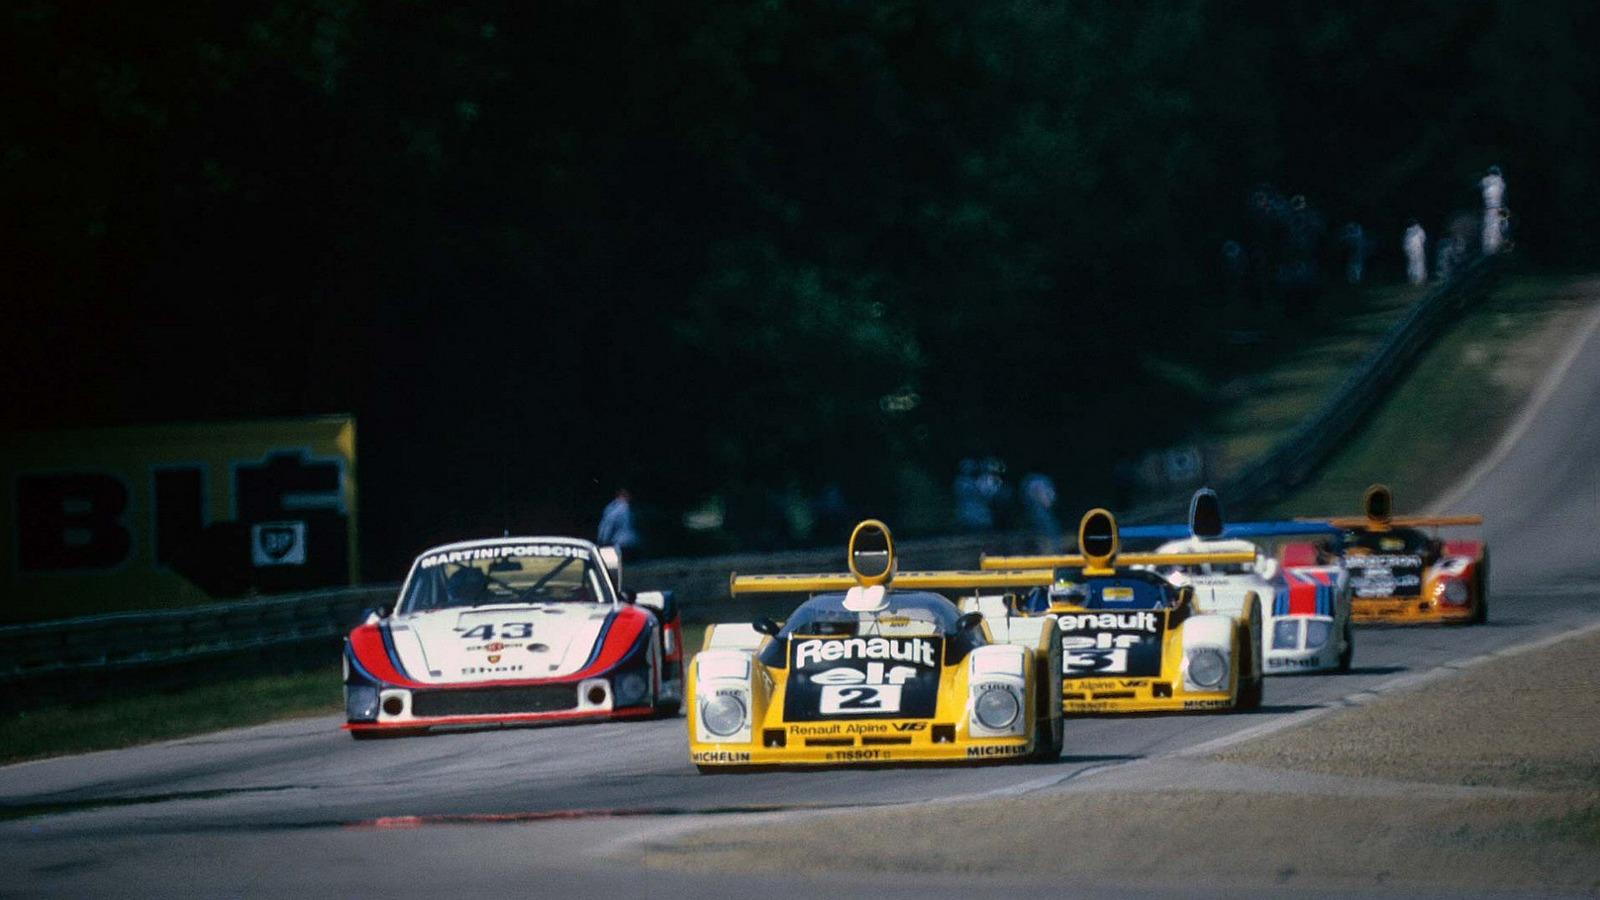 Le Mans 1978. Pironi i bil #2 fører an, med Jarier i bil #3 like bak. En Porsche 935 og 936 henger med, mens den fjerde Renaulten er bakerst i bildet. #1 lå et godt stykke foran denne klyngen.